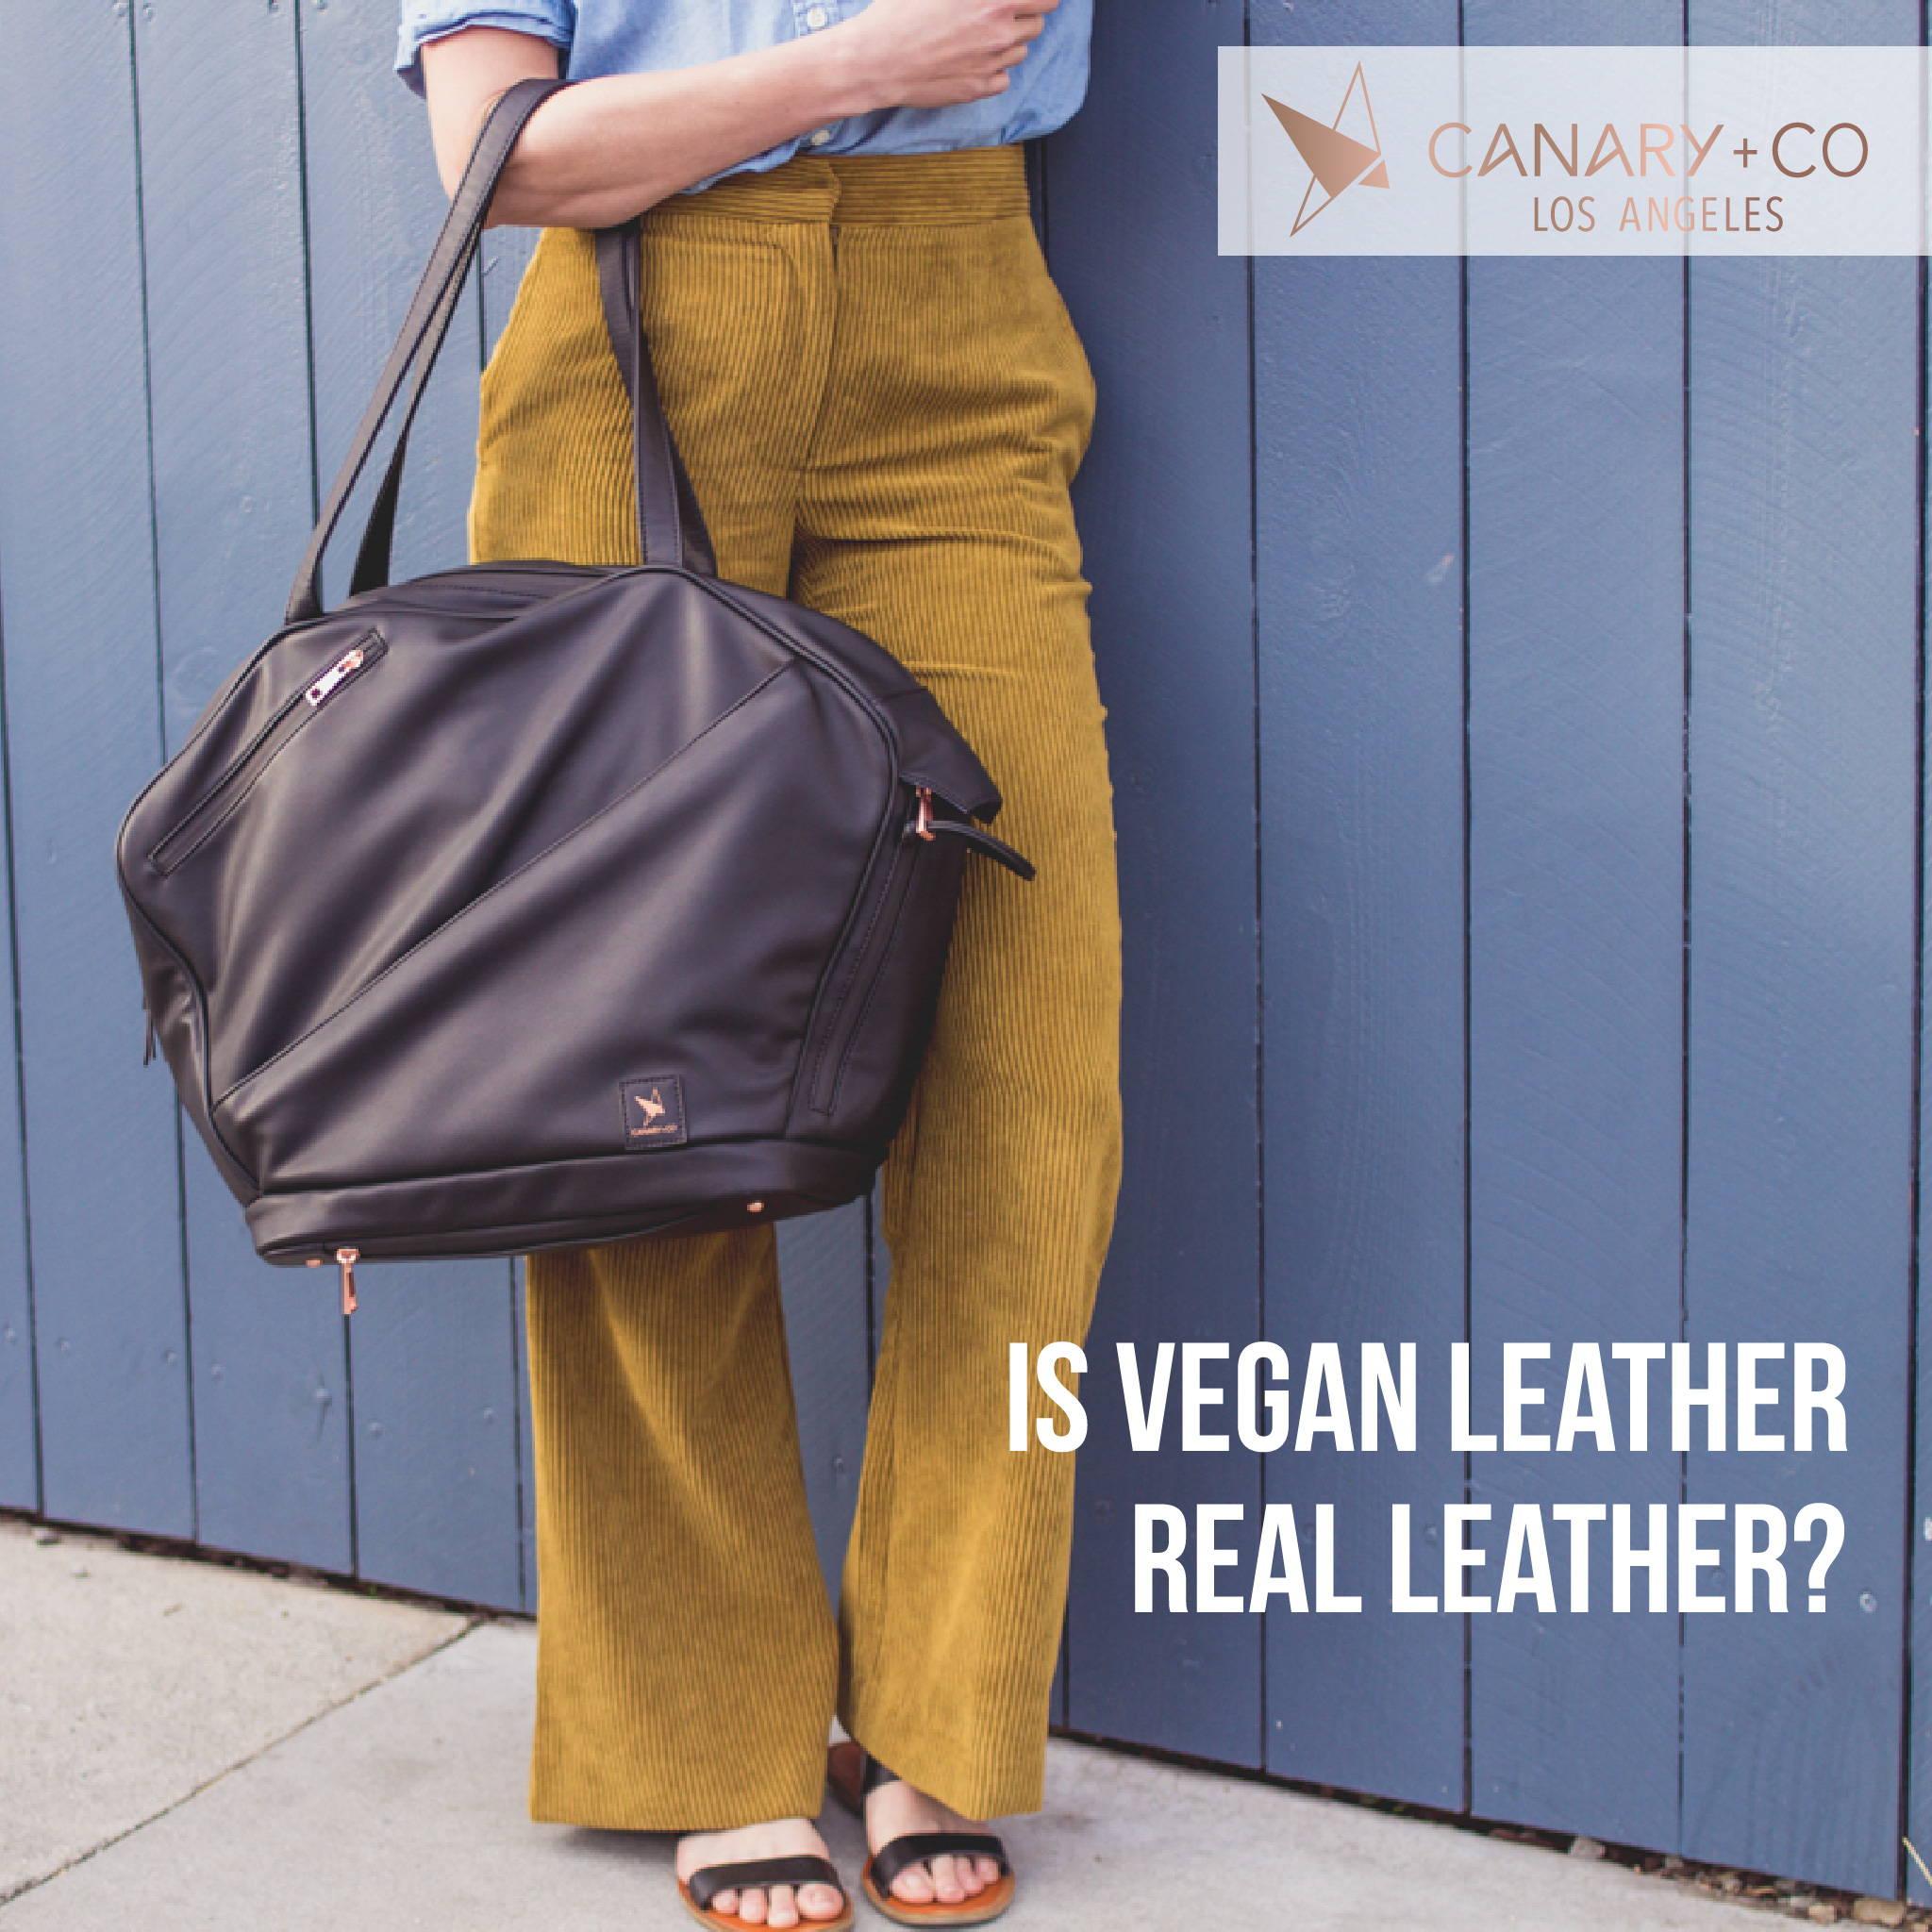 productive work hustle bag purse vegan leather freelance commute girlboss shop women fashion